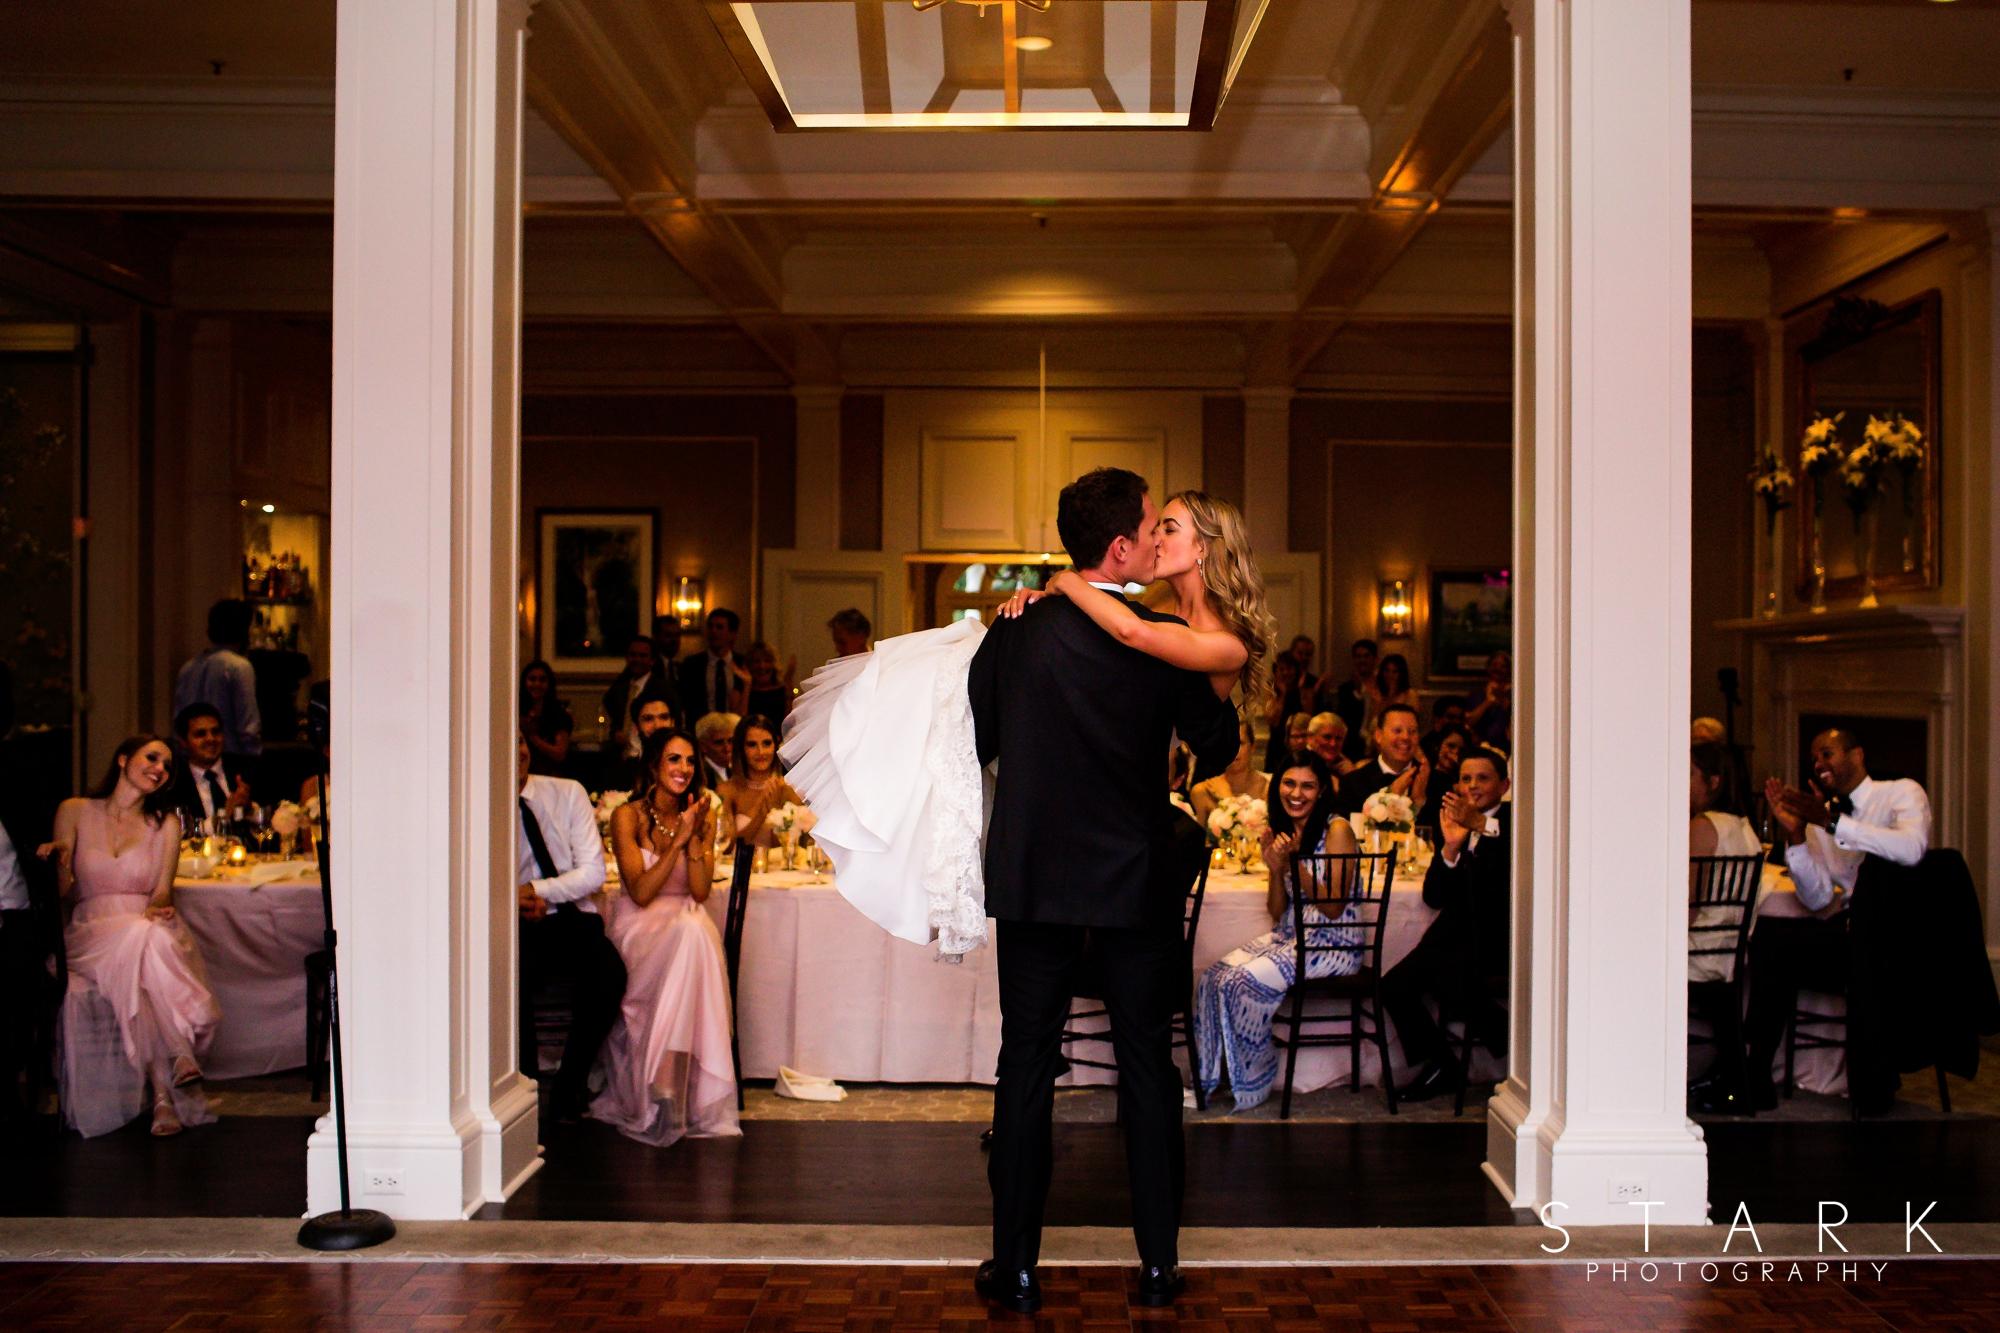 Bridalbliss.com   Portland Wedding   Oregon Wedding Planning and Design   Stark Photography